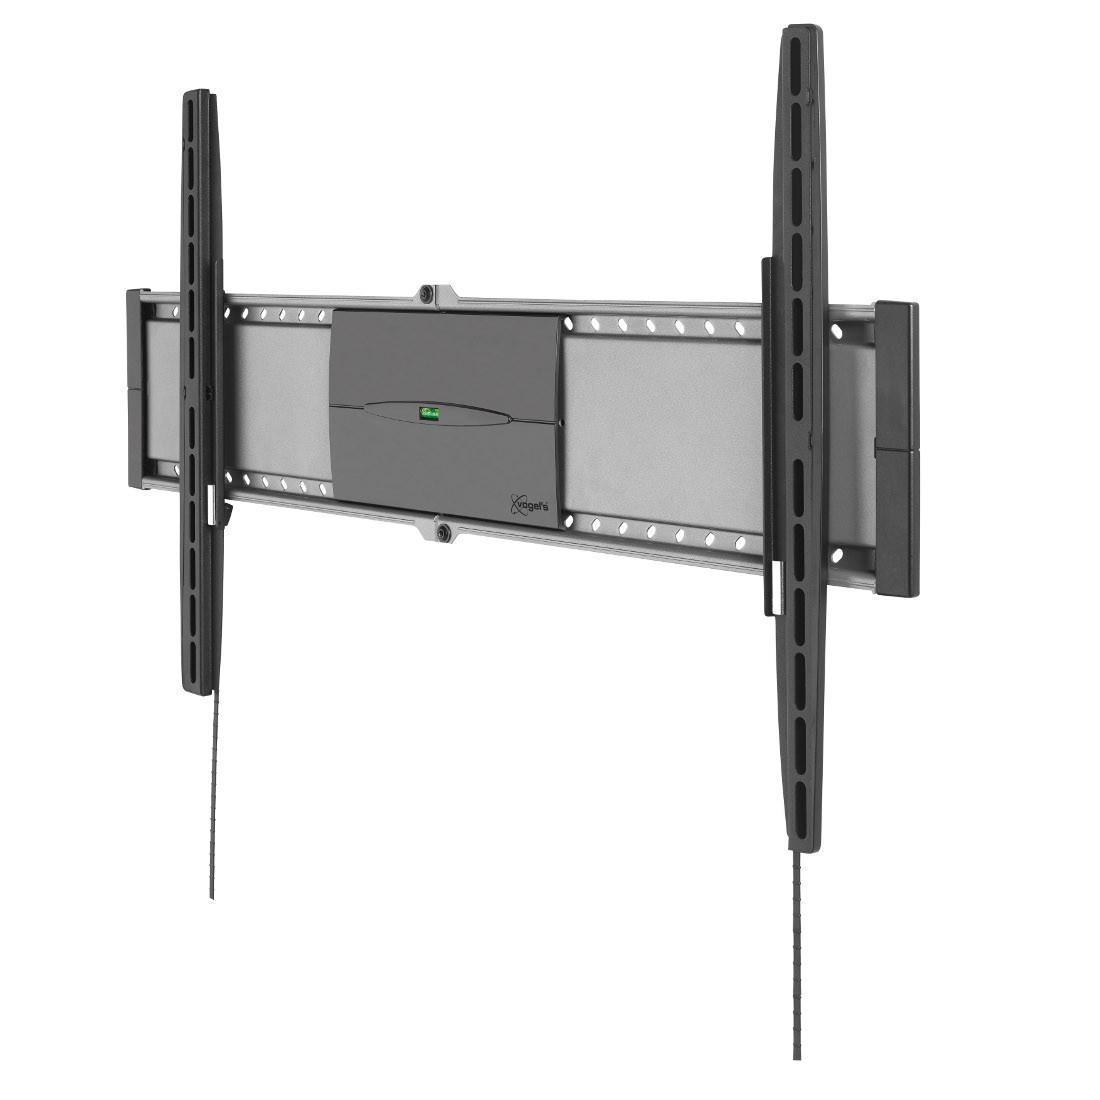 LCD-Wandhalter Superflat 7630, Vogel's günstig